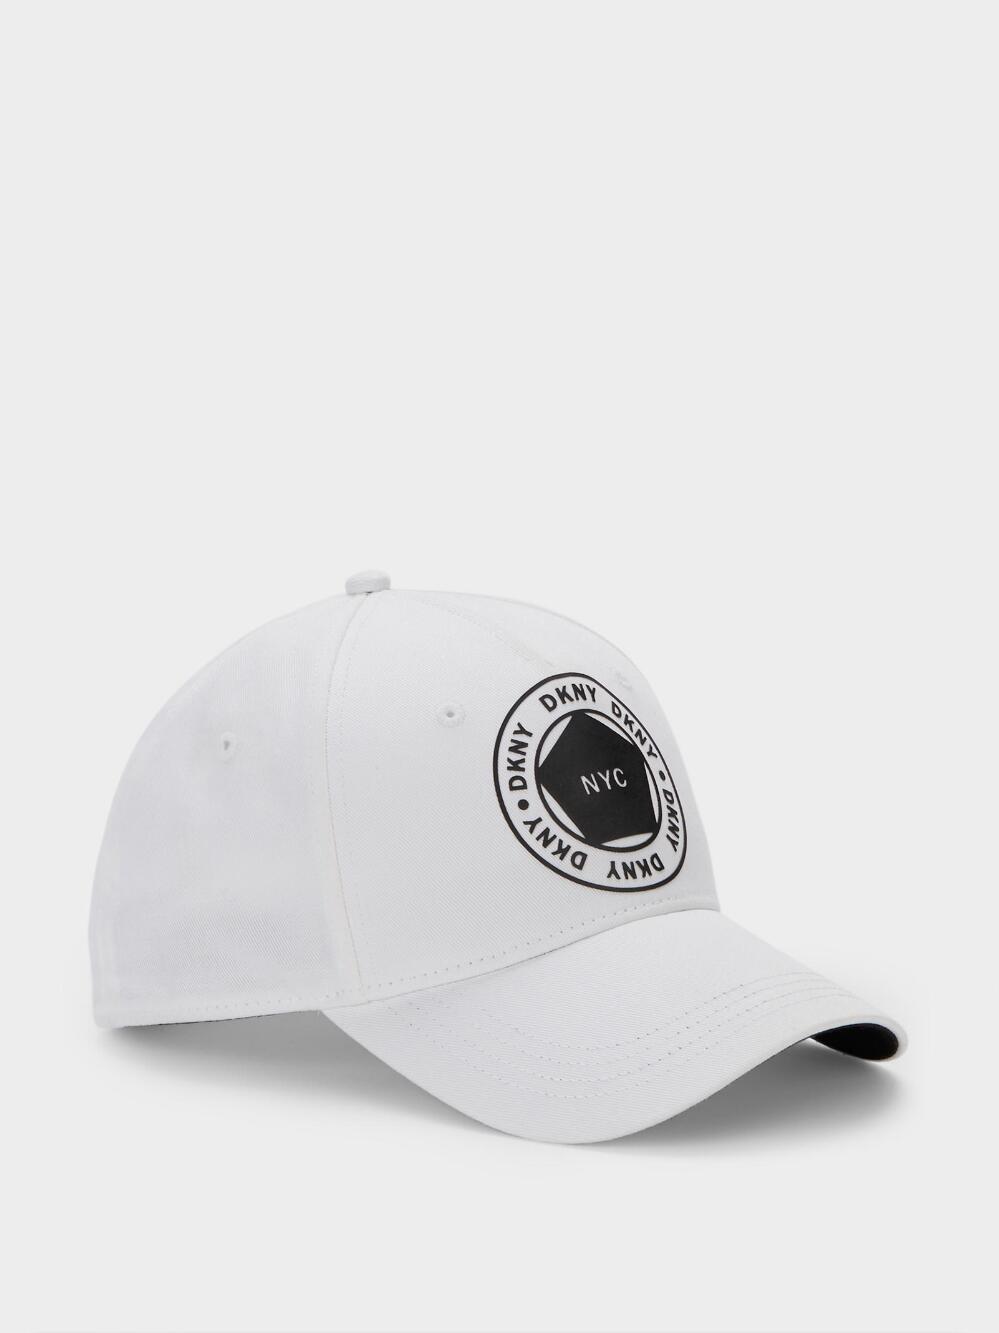 Dkny Token Logo Hat - Olympn Blue O S  712c24e4a17c